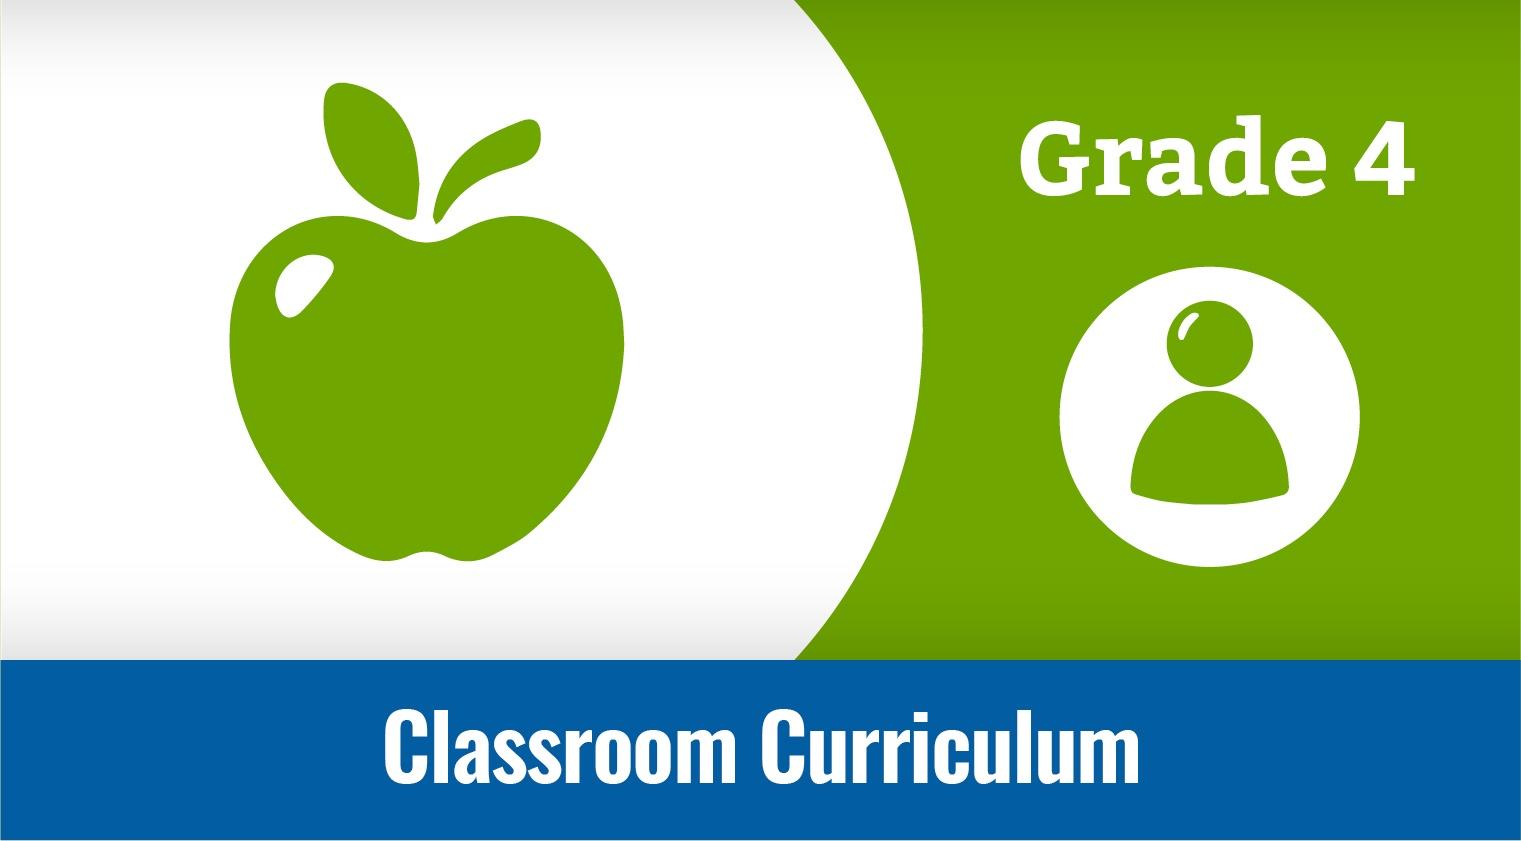 Grade 4 Classroom Curriculum - Taking Off